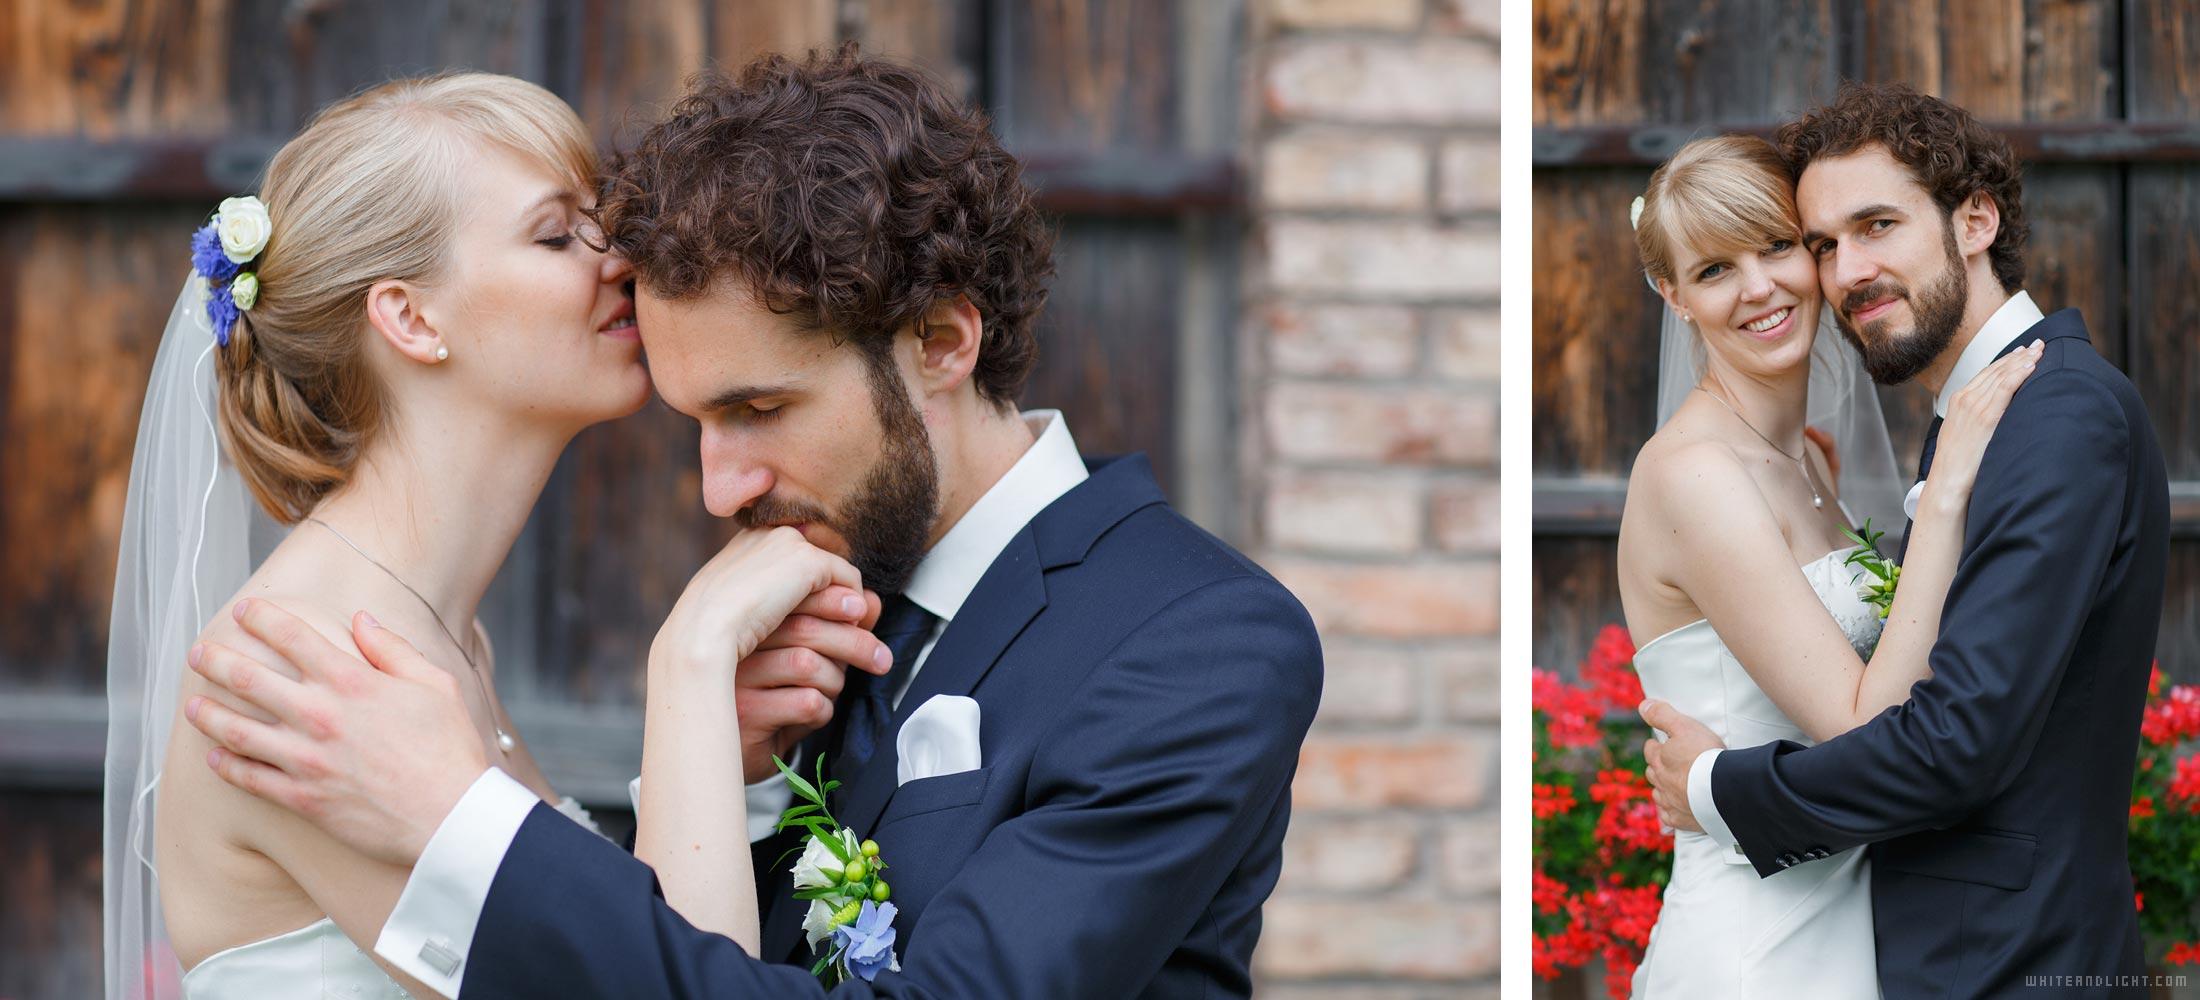 жениться бавария